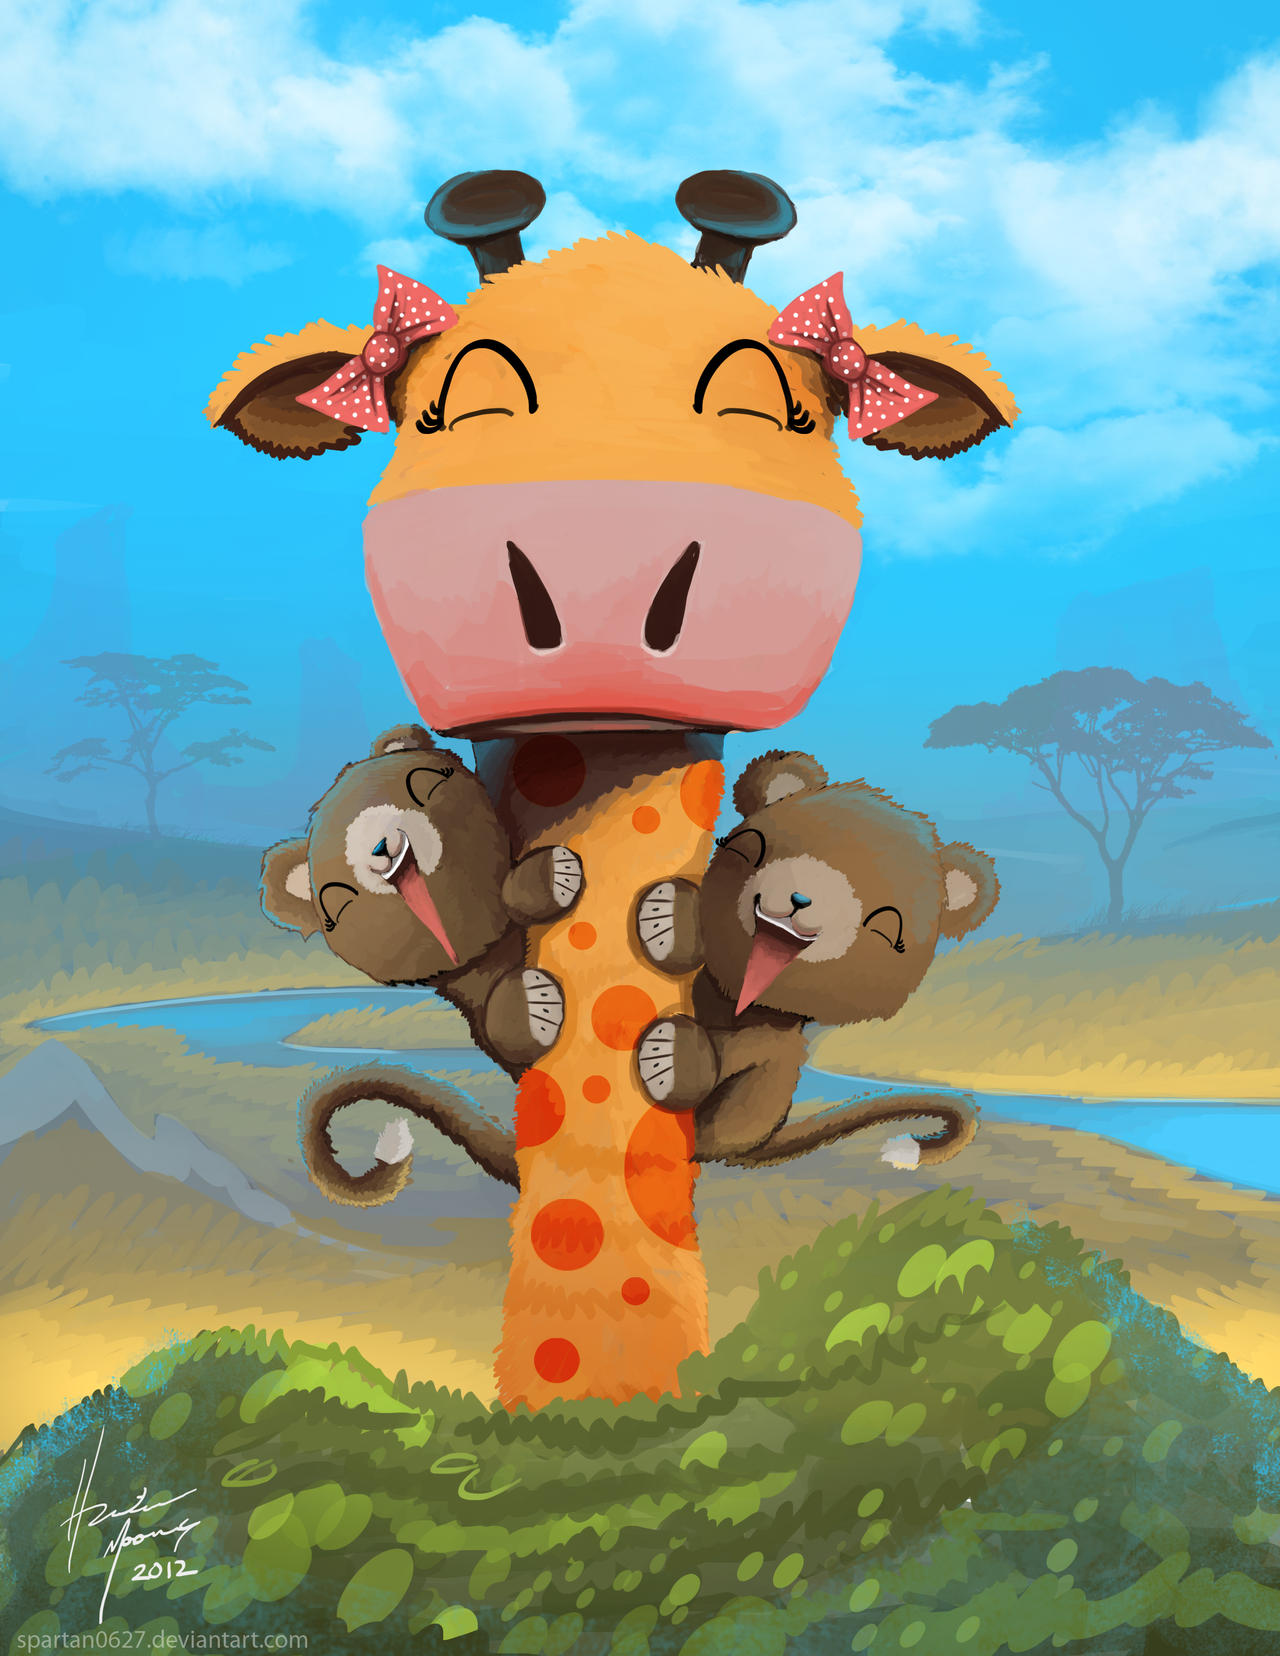 Giraffe by Spartan0627